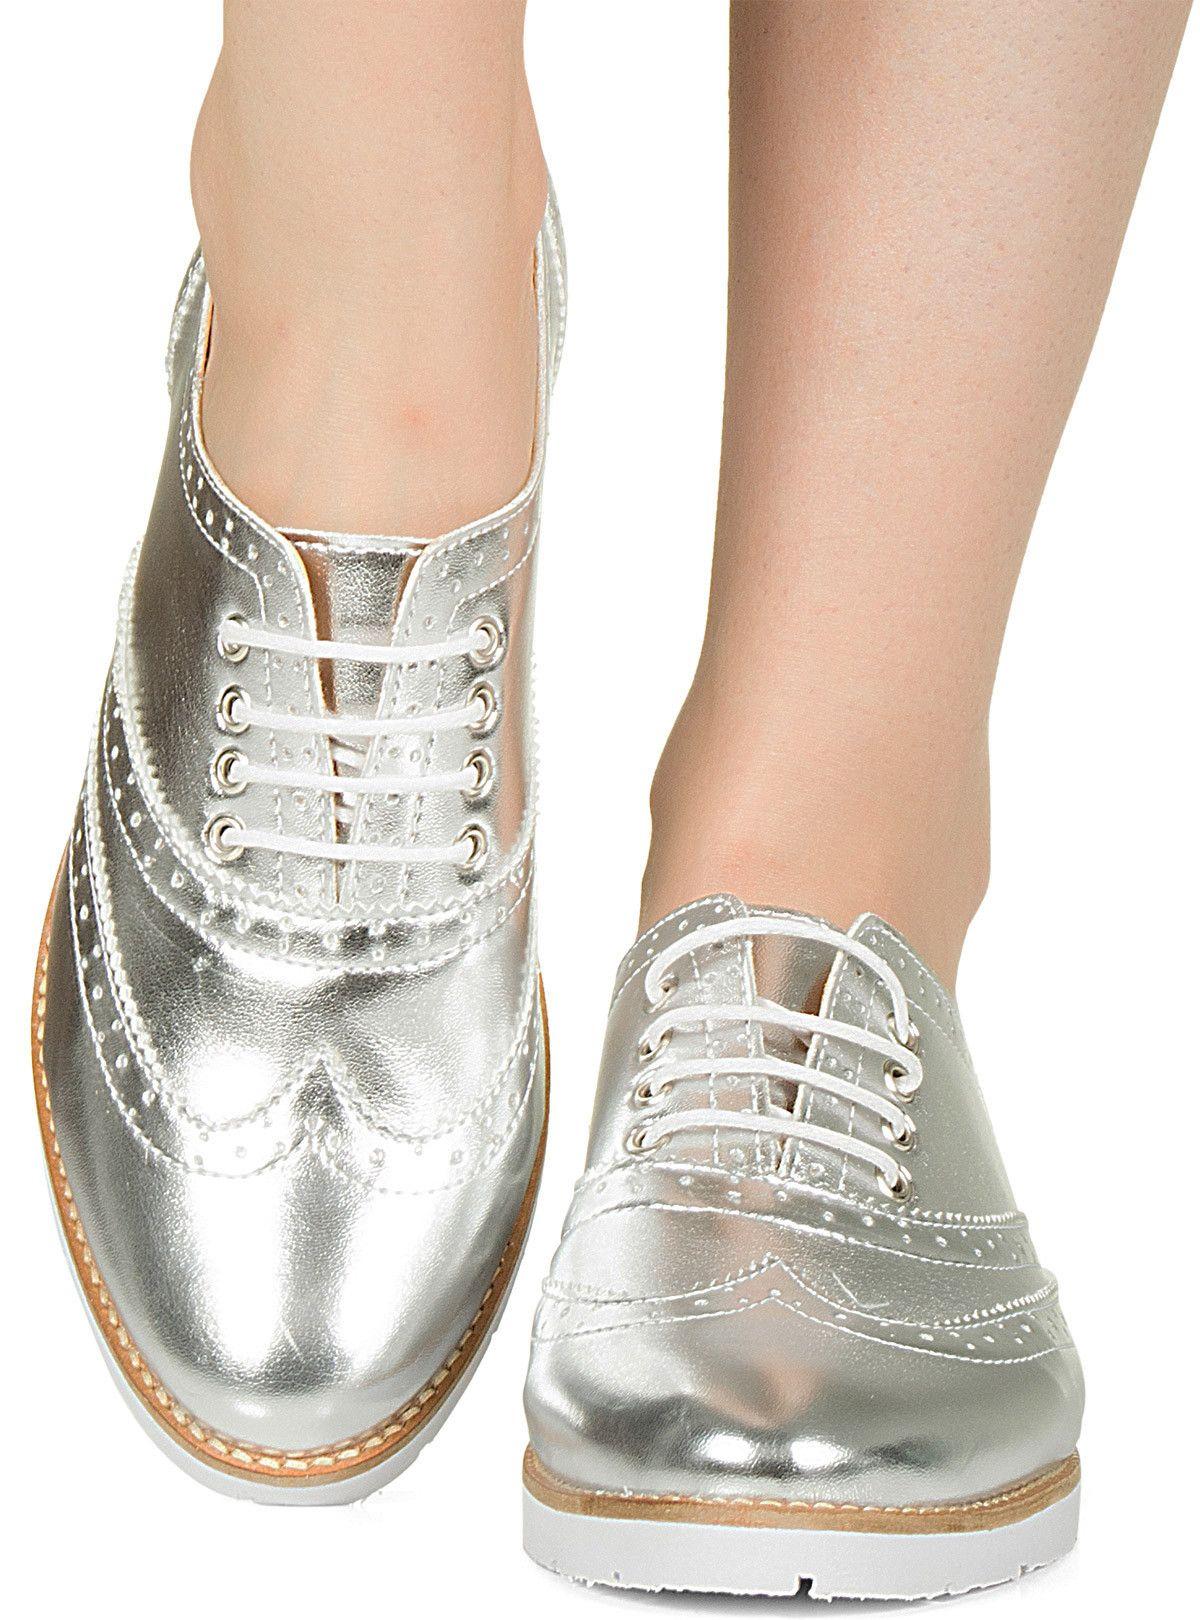 25bd2c7c52 Sapato oxford prata metalizado Taquilla - Taquilla - Loja online de sapatos  femininos